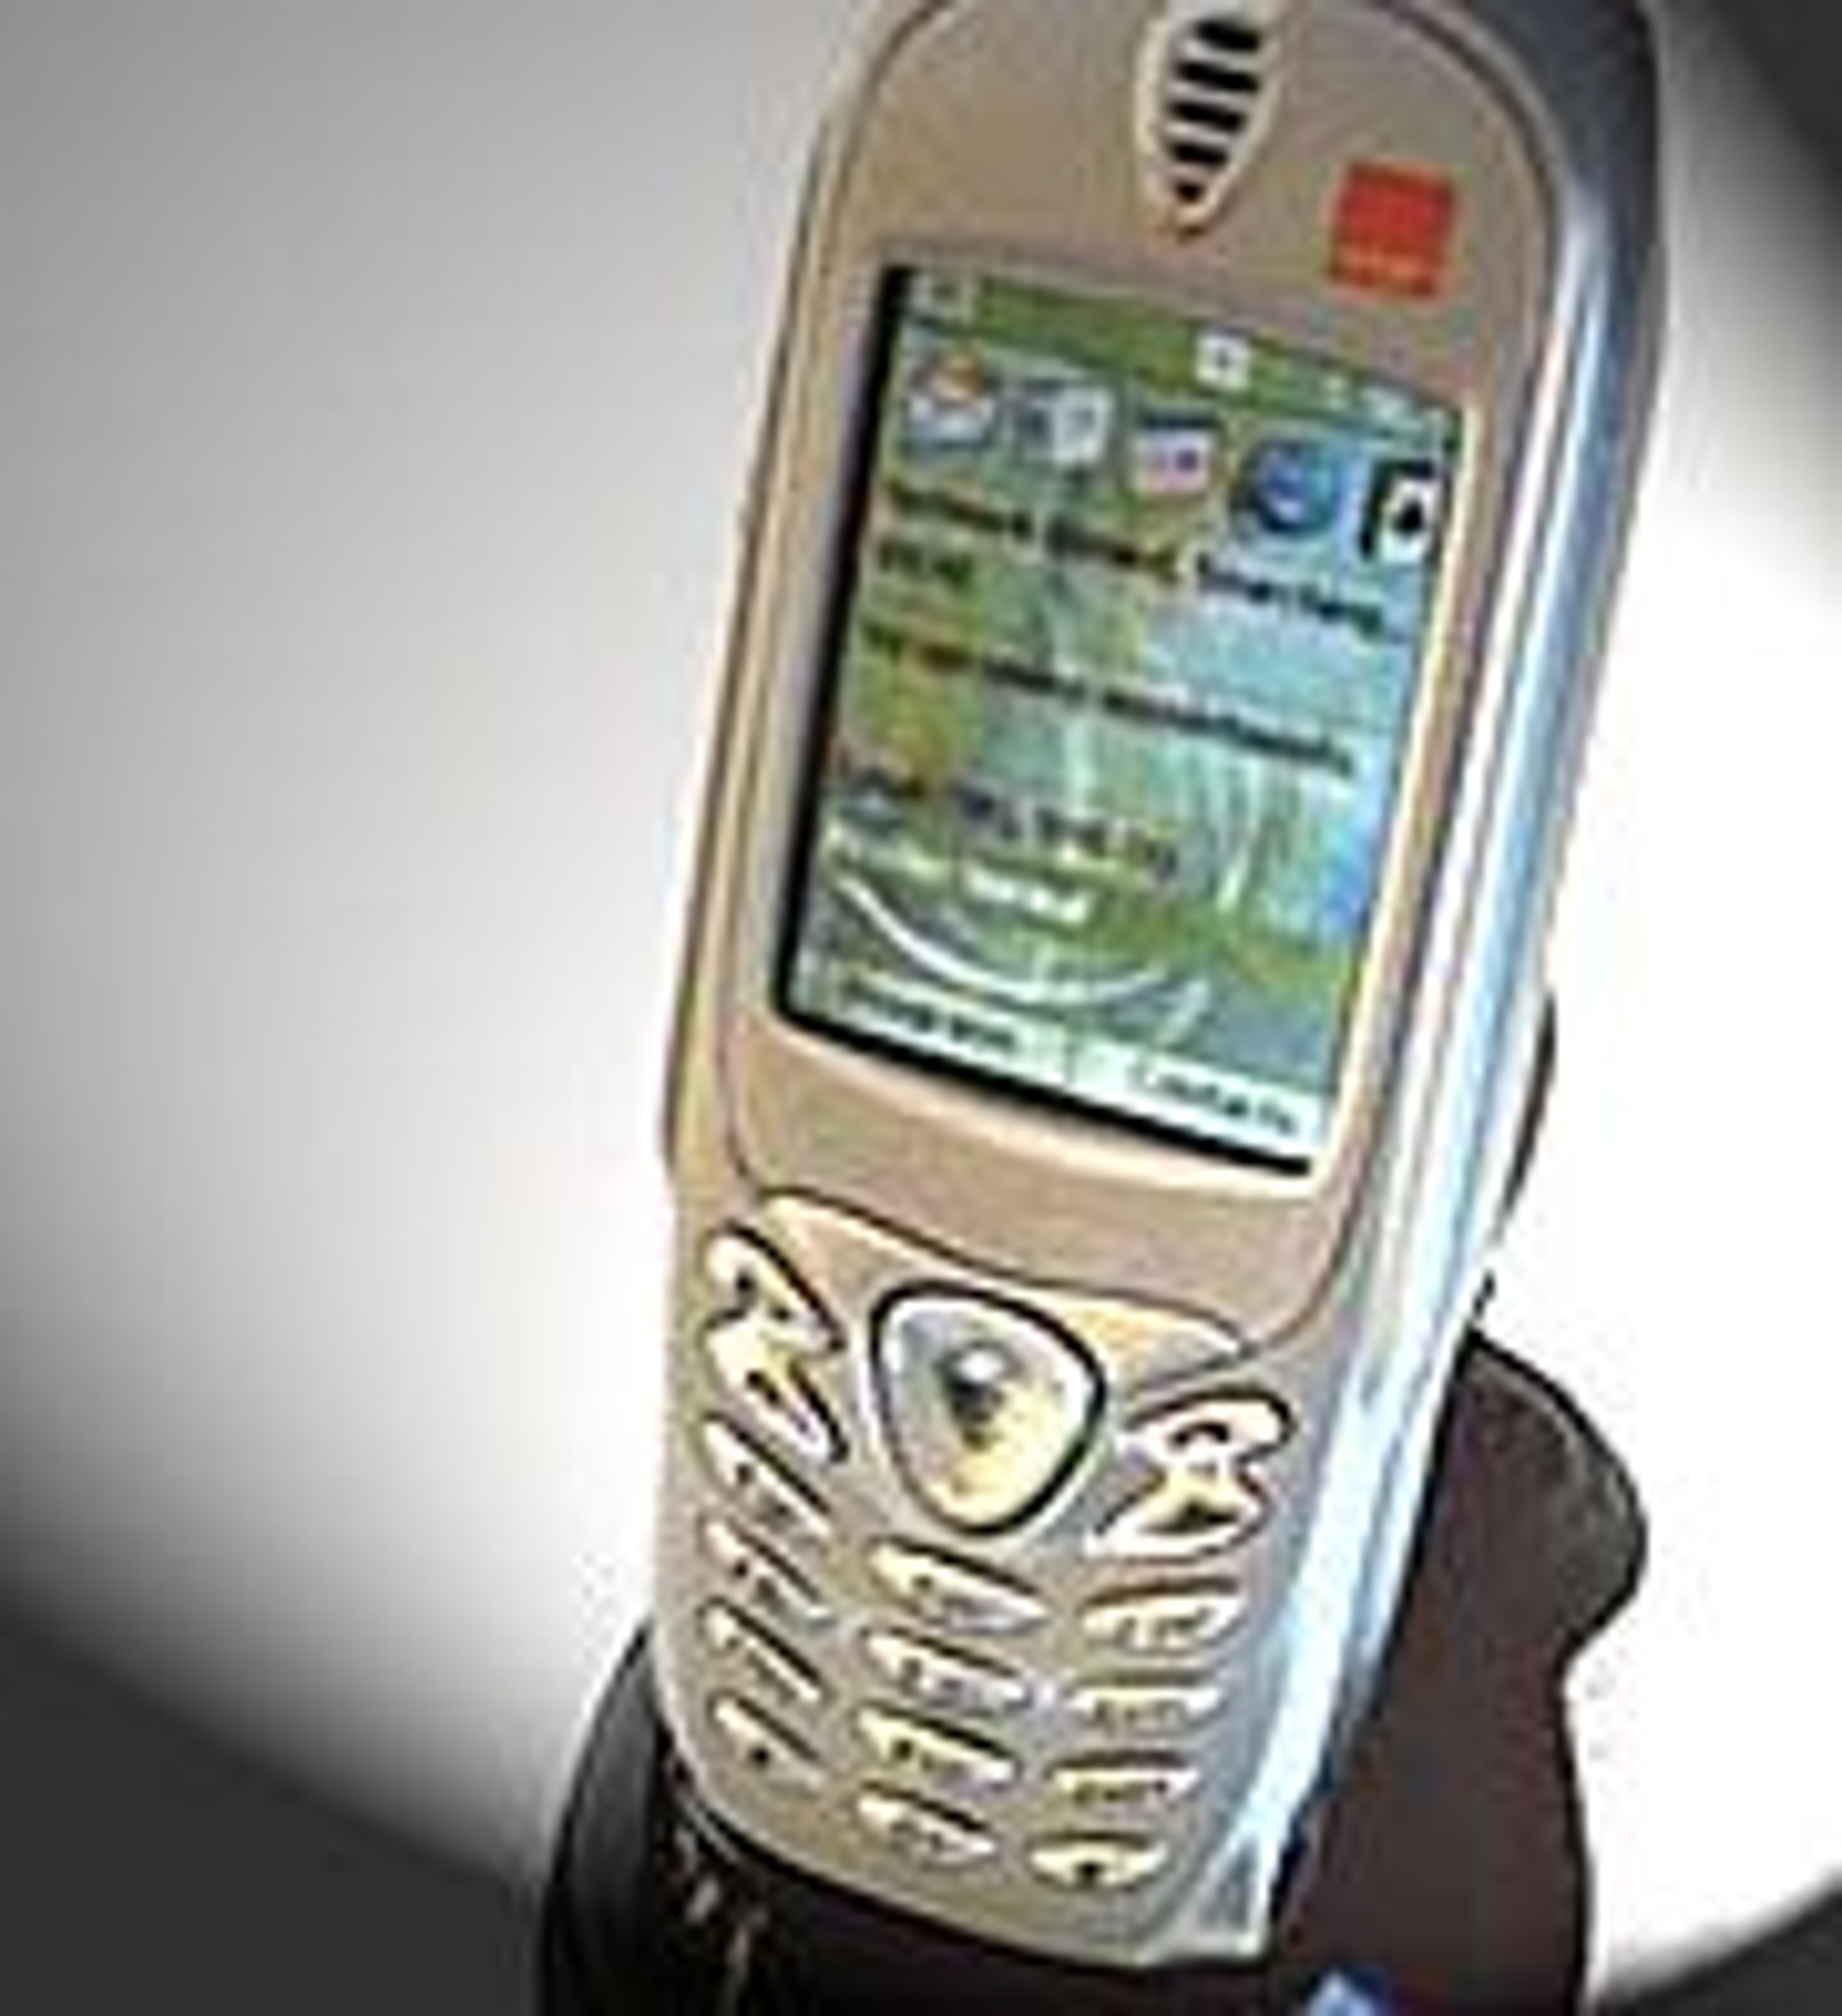 mobiltelefon test hordaland